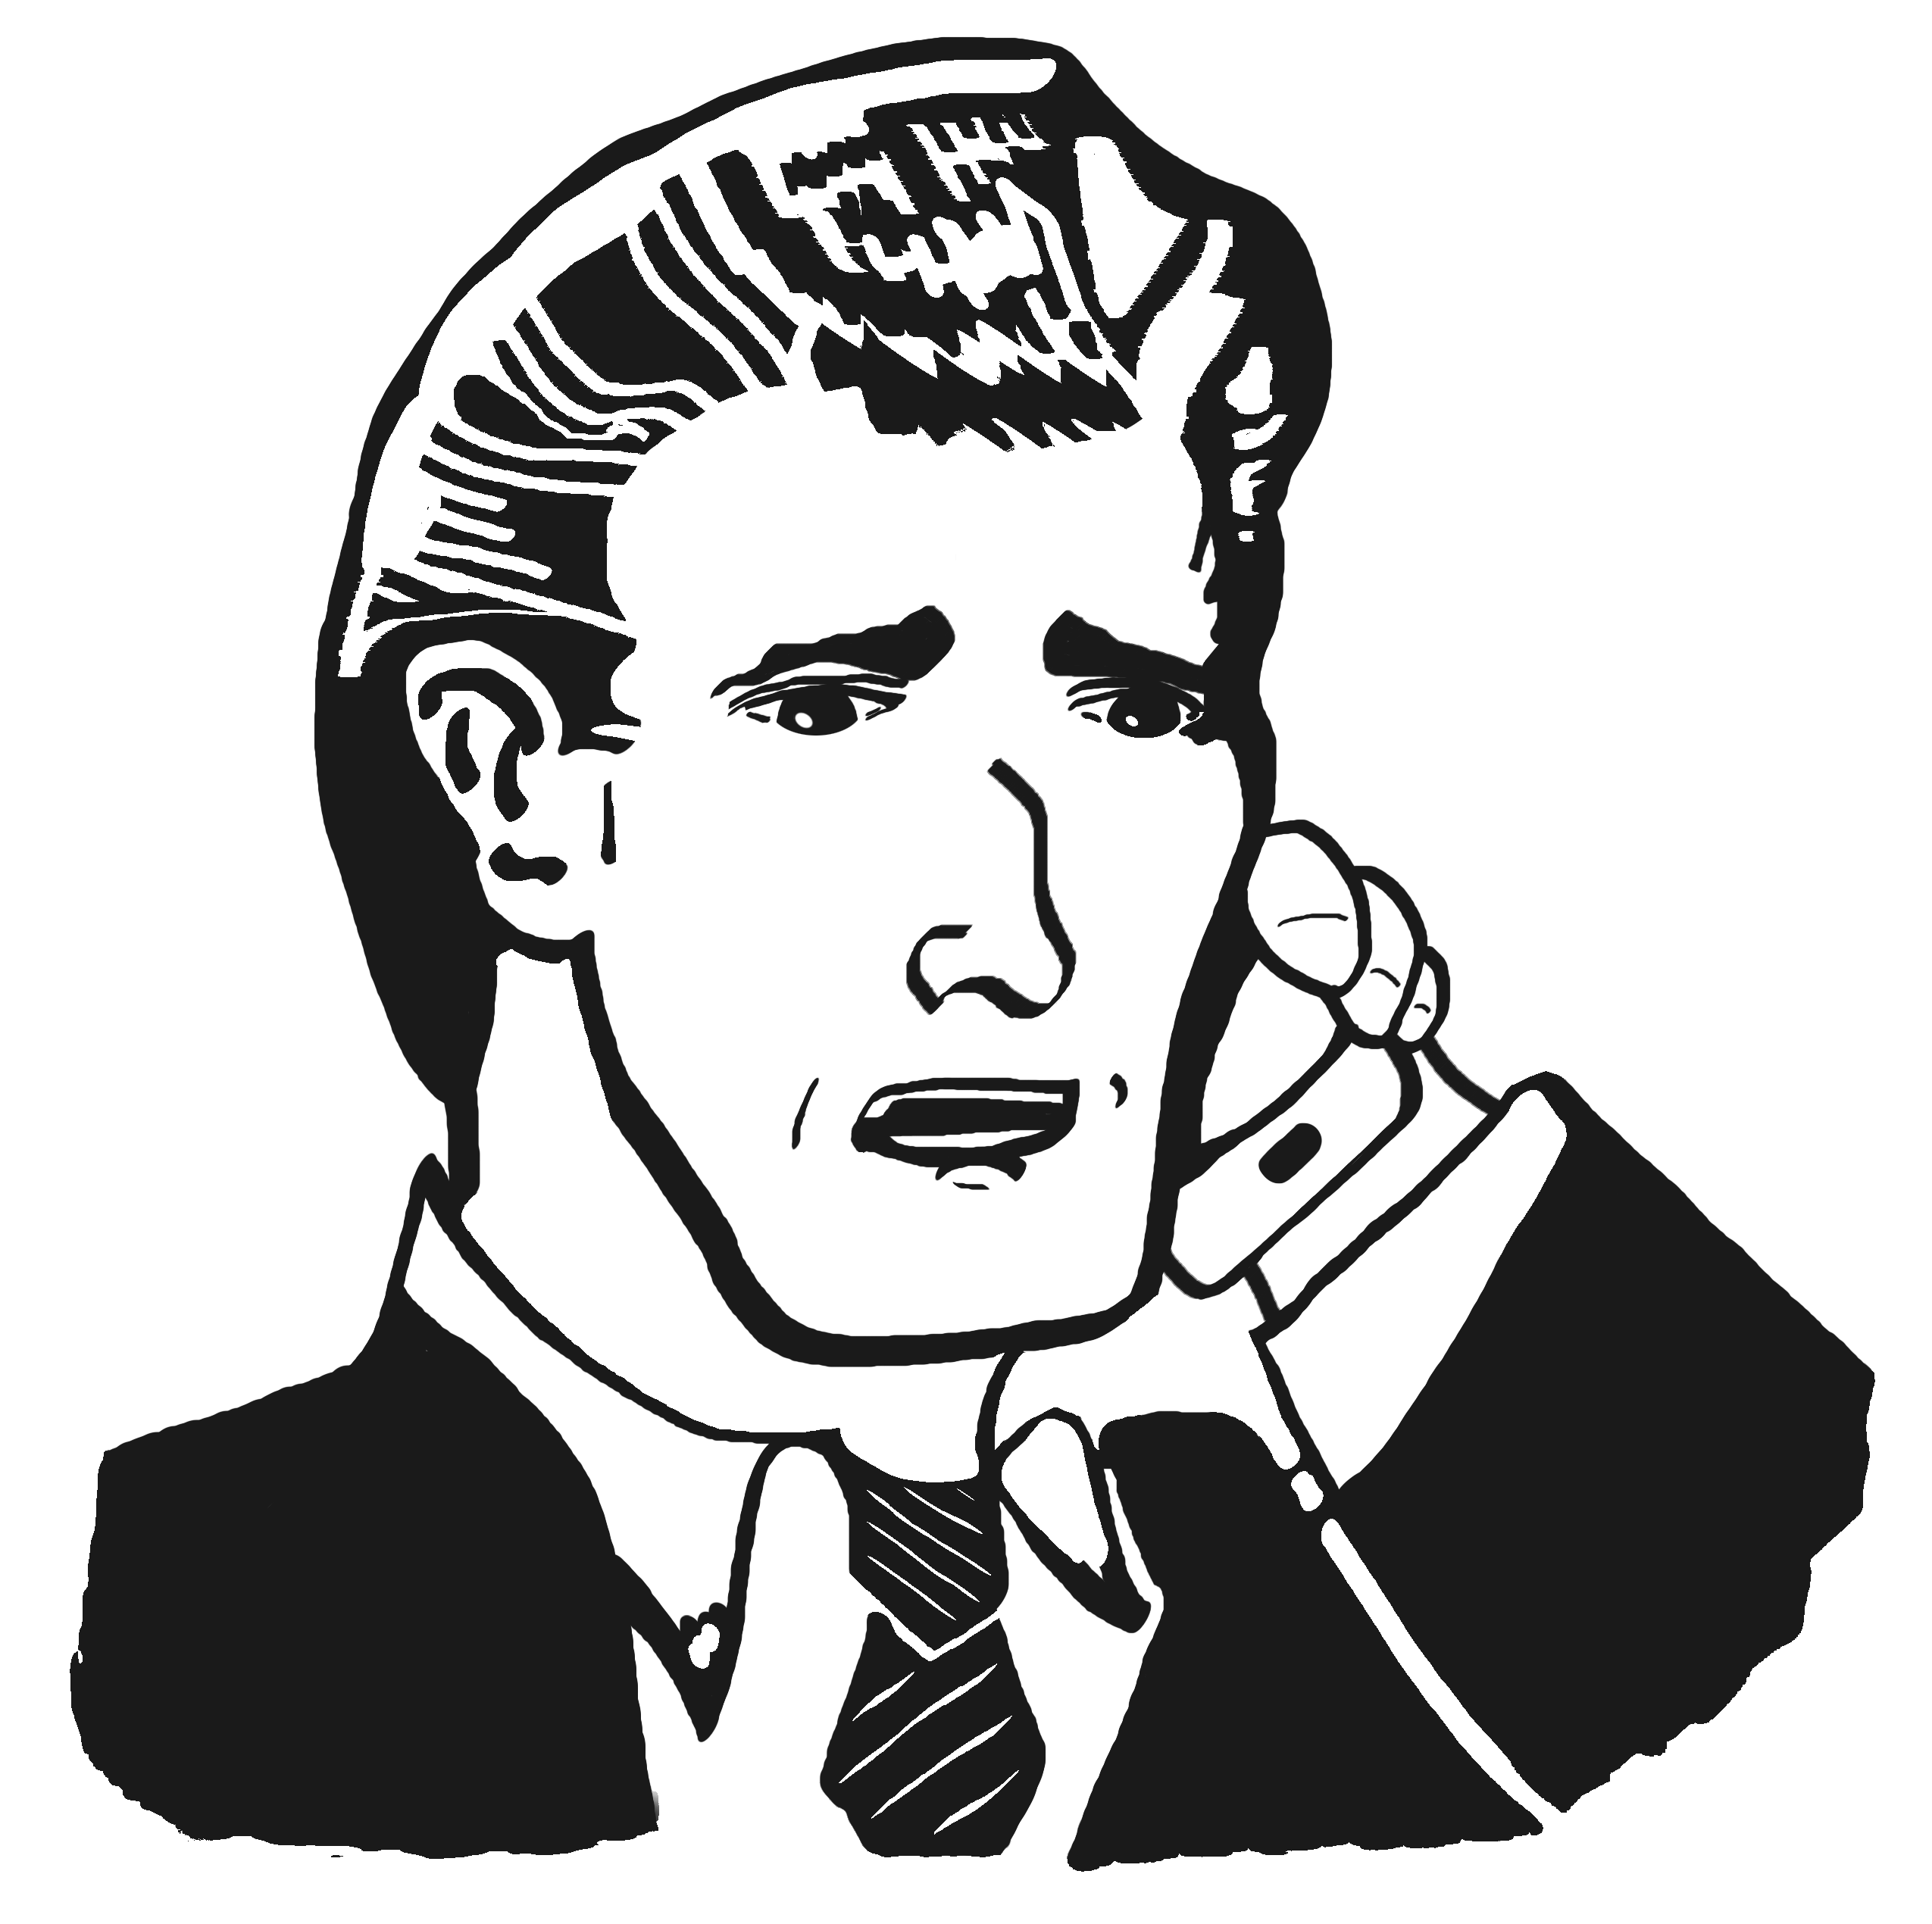 phone call guy2